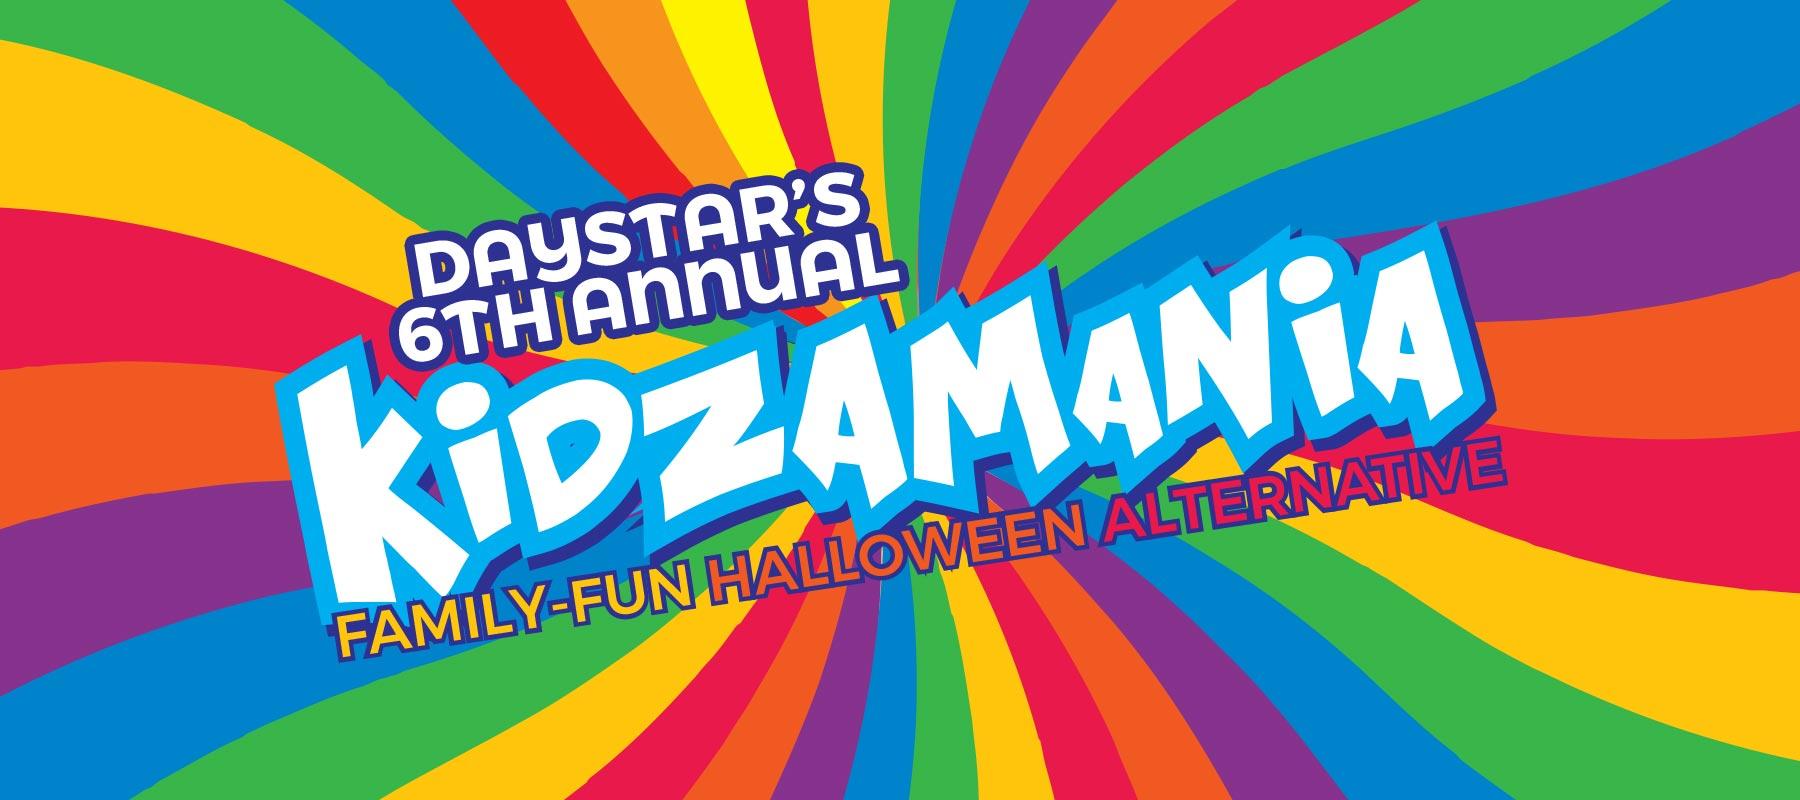 Kidzamania 6th Annual - Daystar Church Leduc